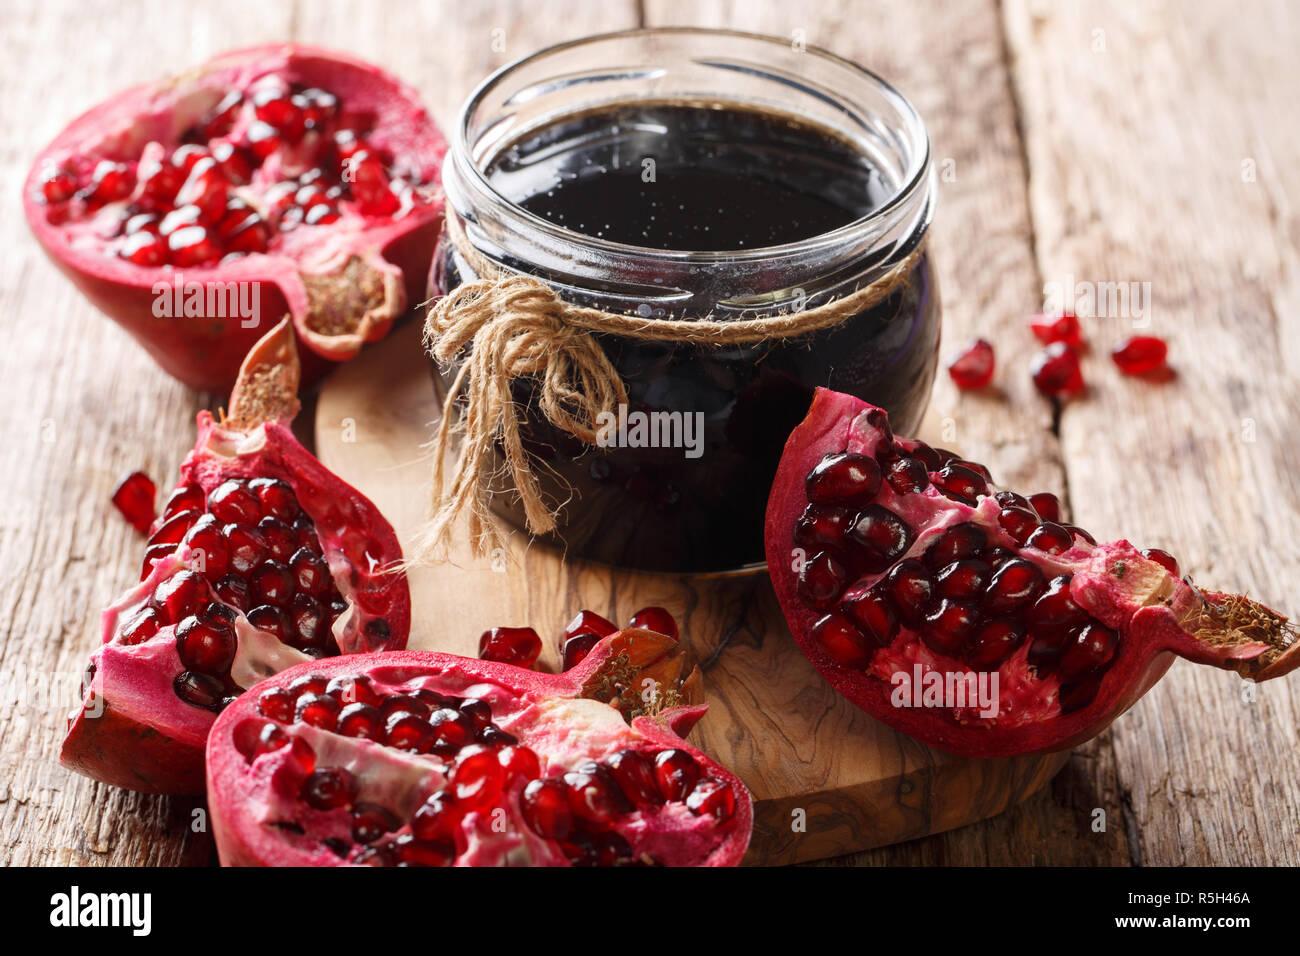 Azerbaijani narsharab seasoning obtained by thickening pomegranate juice close-up on the table. horizontal - Stock Image